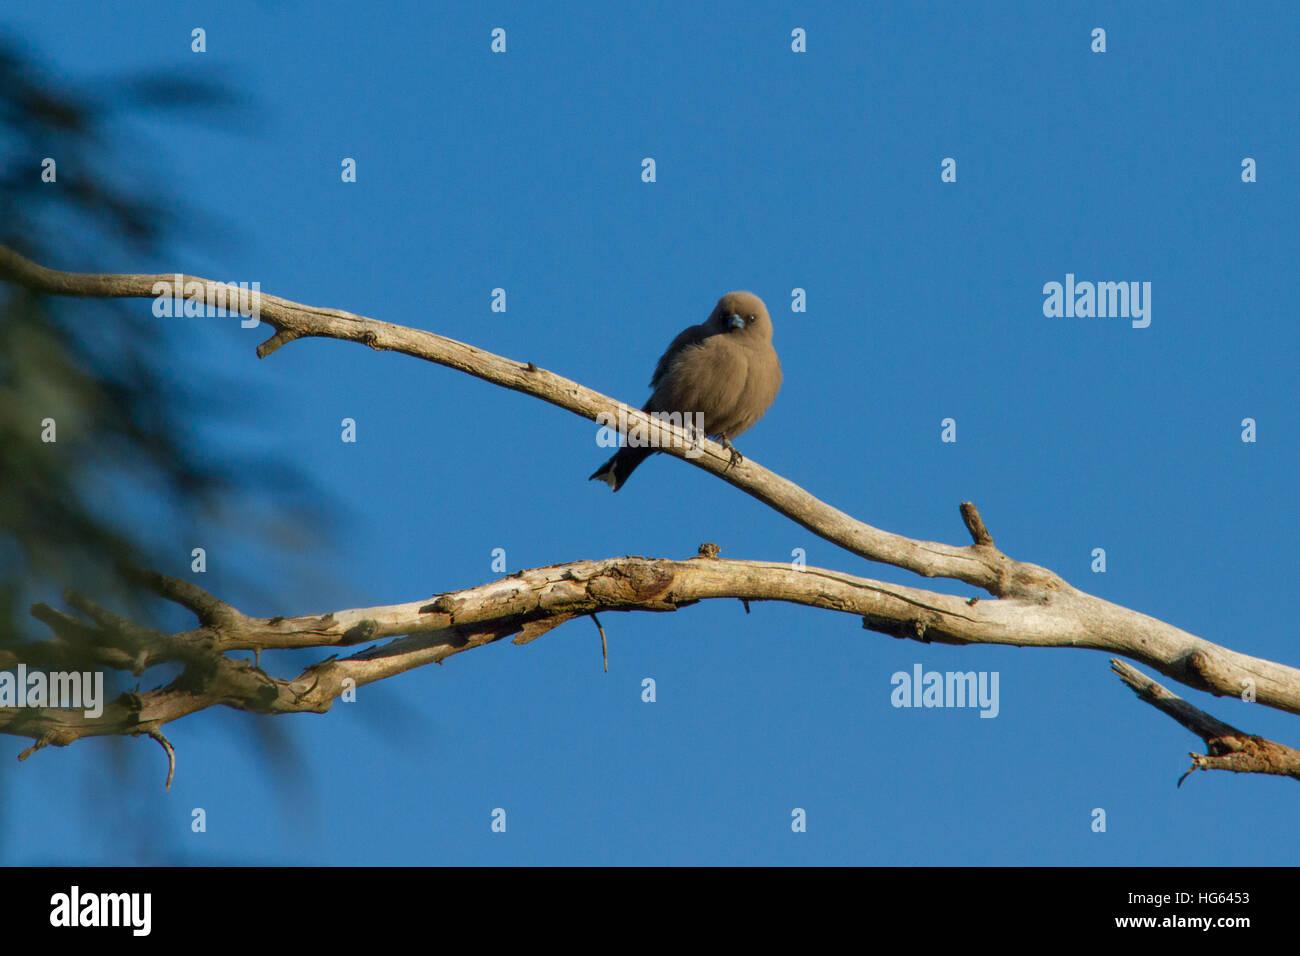 Dusky Woodswallow (Artamus cyanopterus) perched on a branch - Stock Image